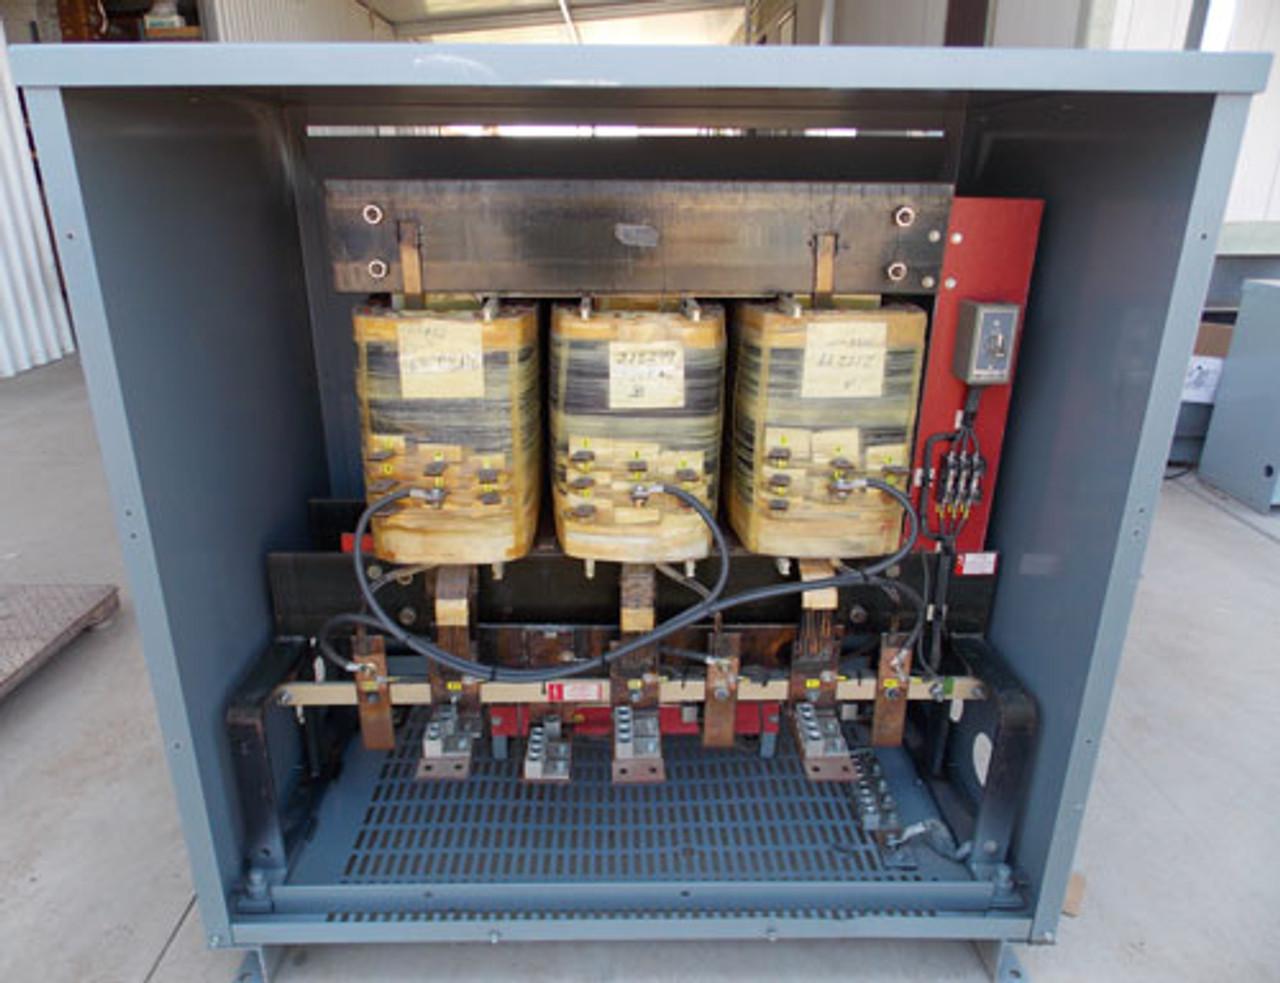 Square D 225T3HBISFILCU 225 KVA 480V to 208Y/120V 3PH Transformer N1 - Reconditioned